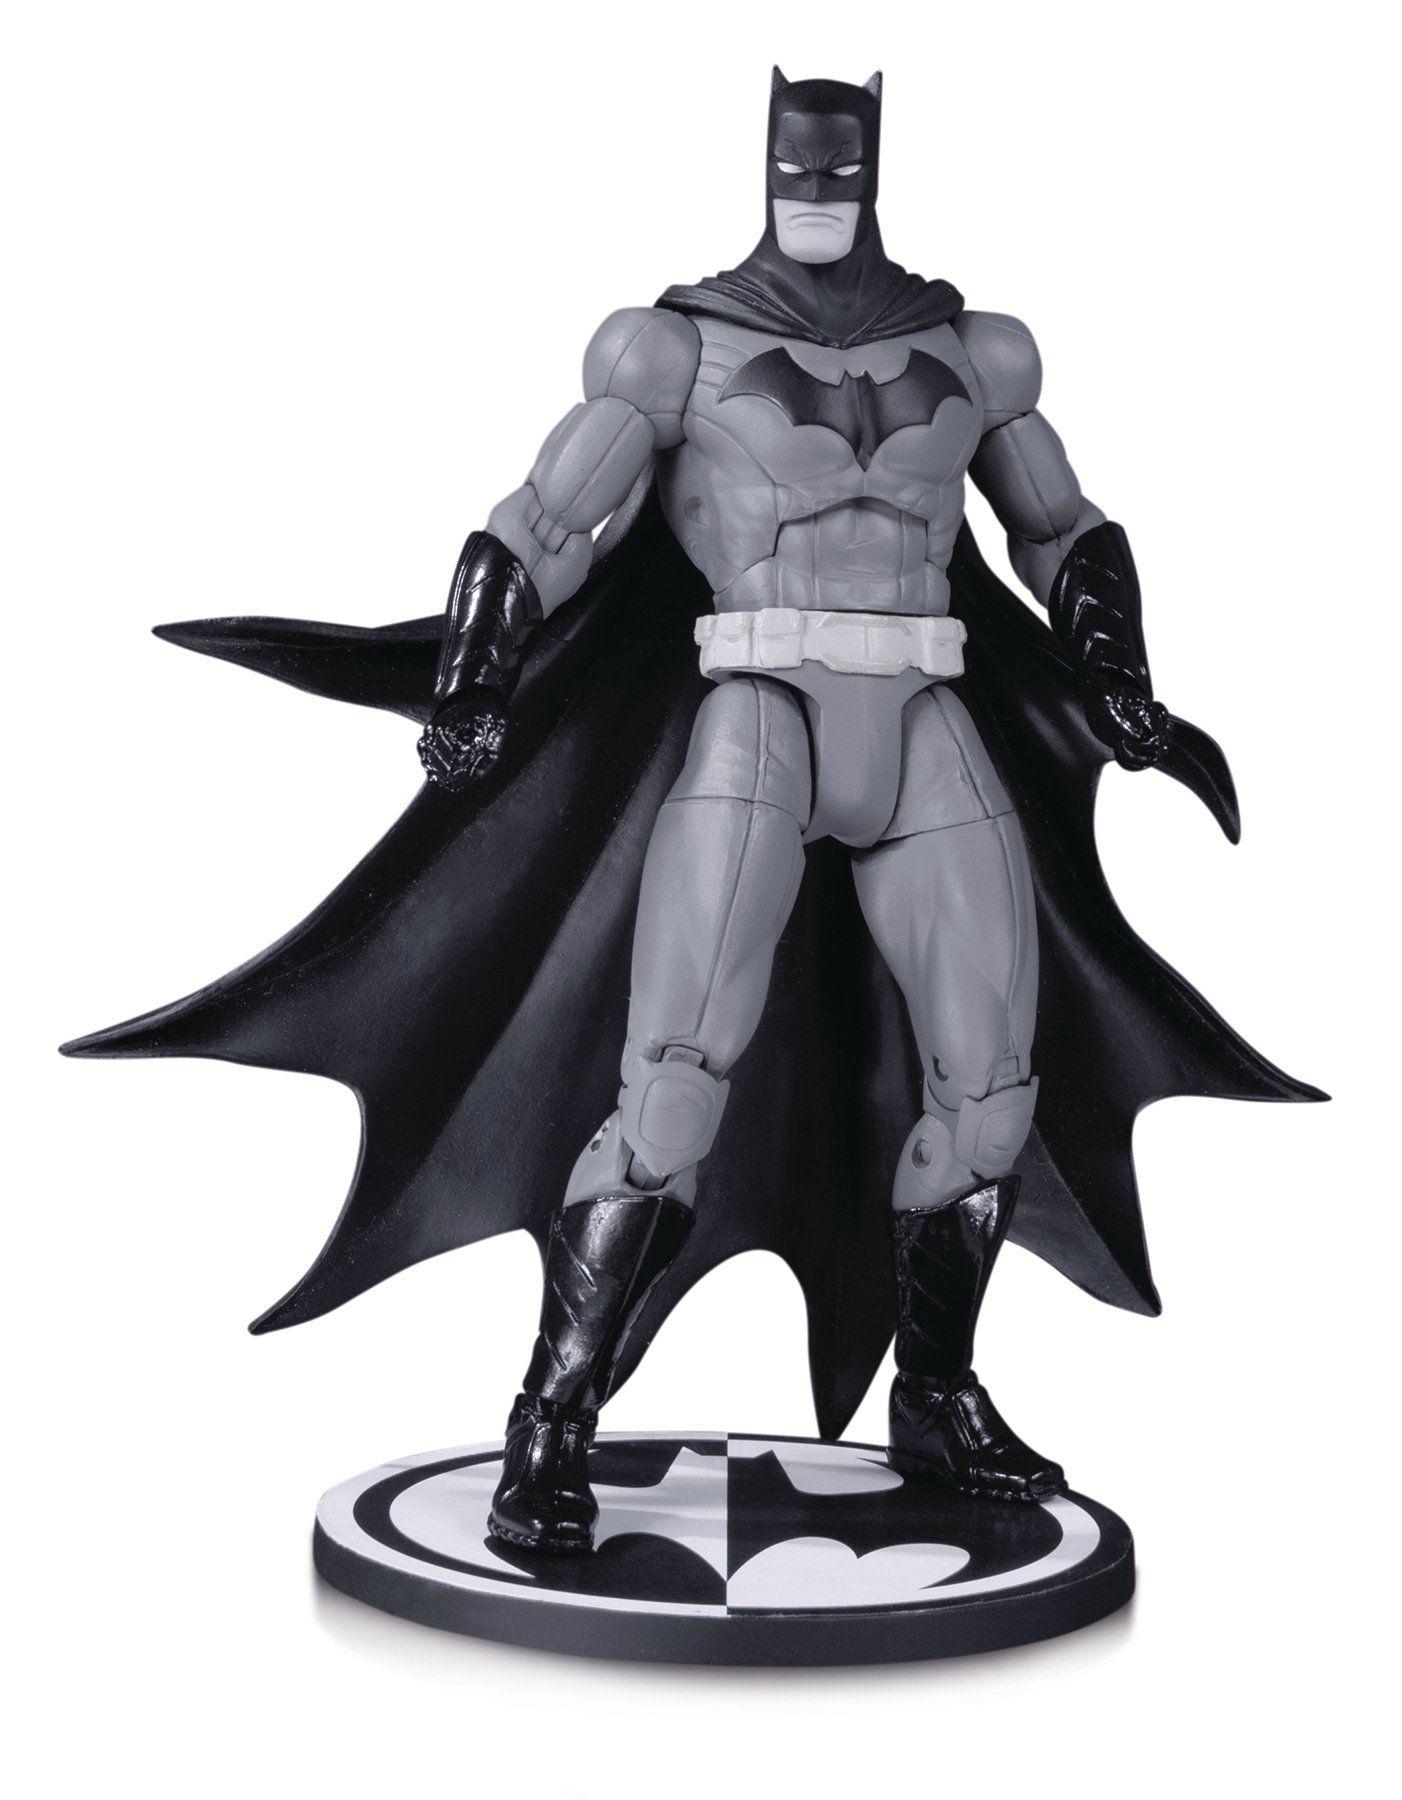 Action Figure Batman: Black And White Boneco Colecionável (by Greg Capullo) - DC Collectibles - CD